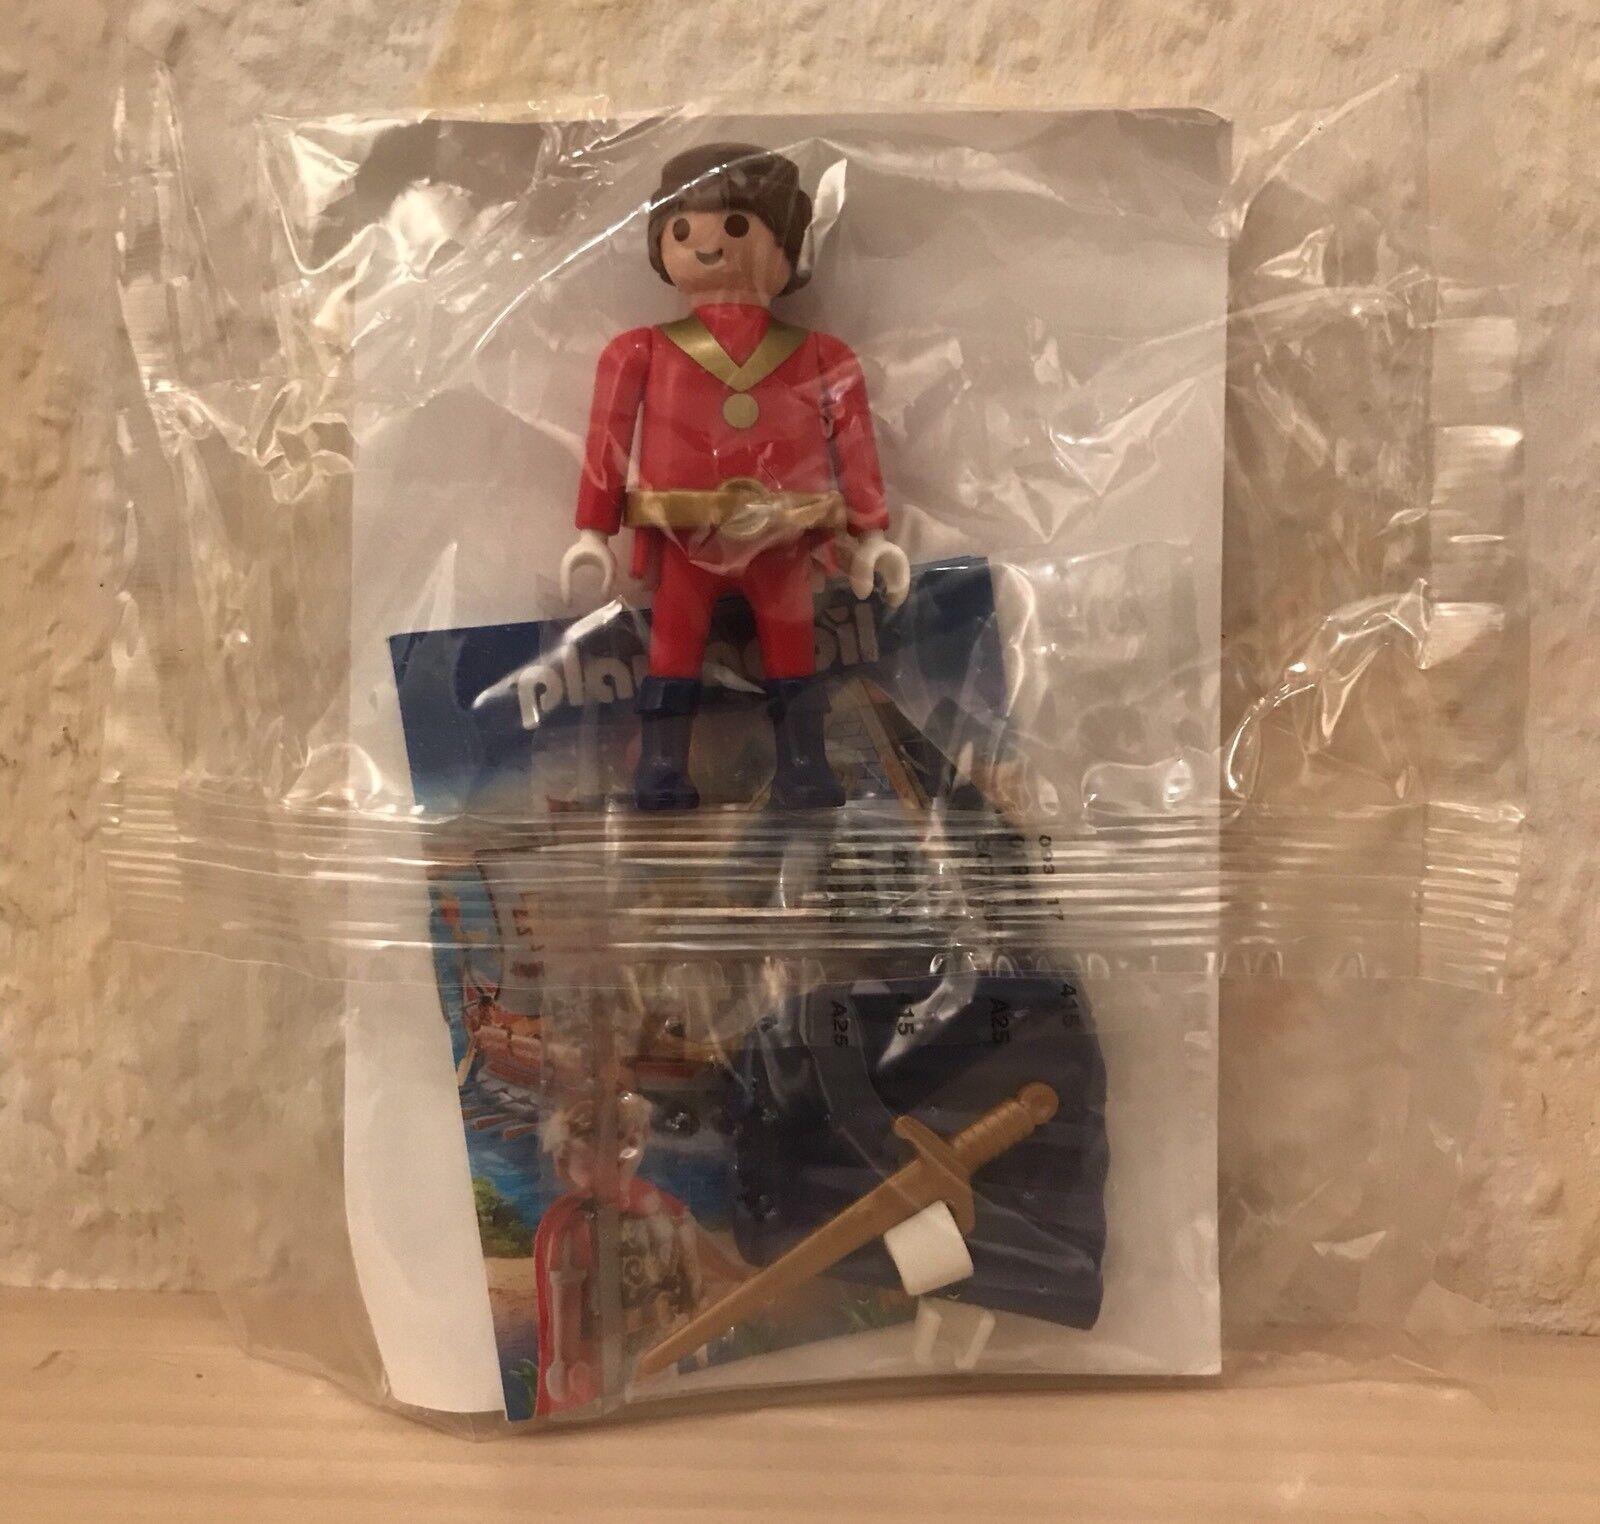 Playmobil - PRINZ DE BEUKELAER - Limited Edition - NEU OVP - VERSAND DOUBLEBOXED